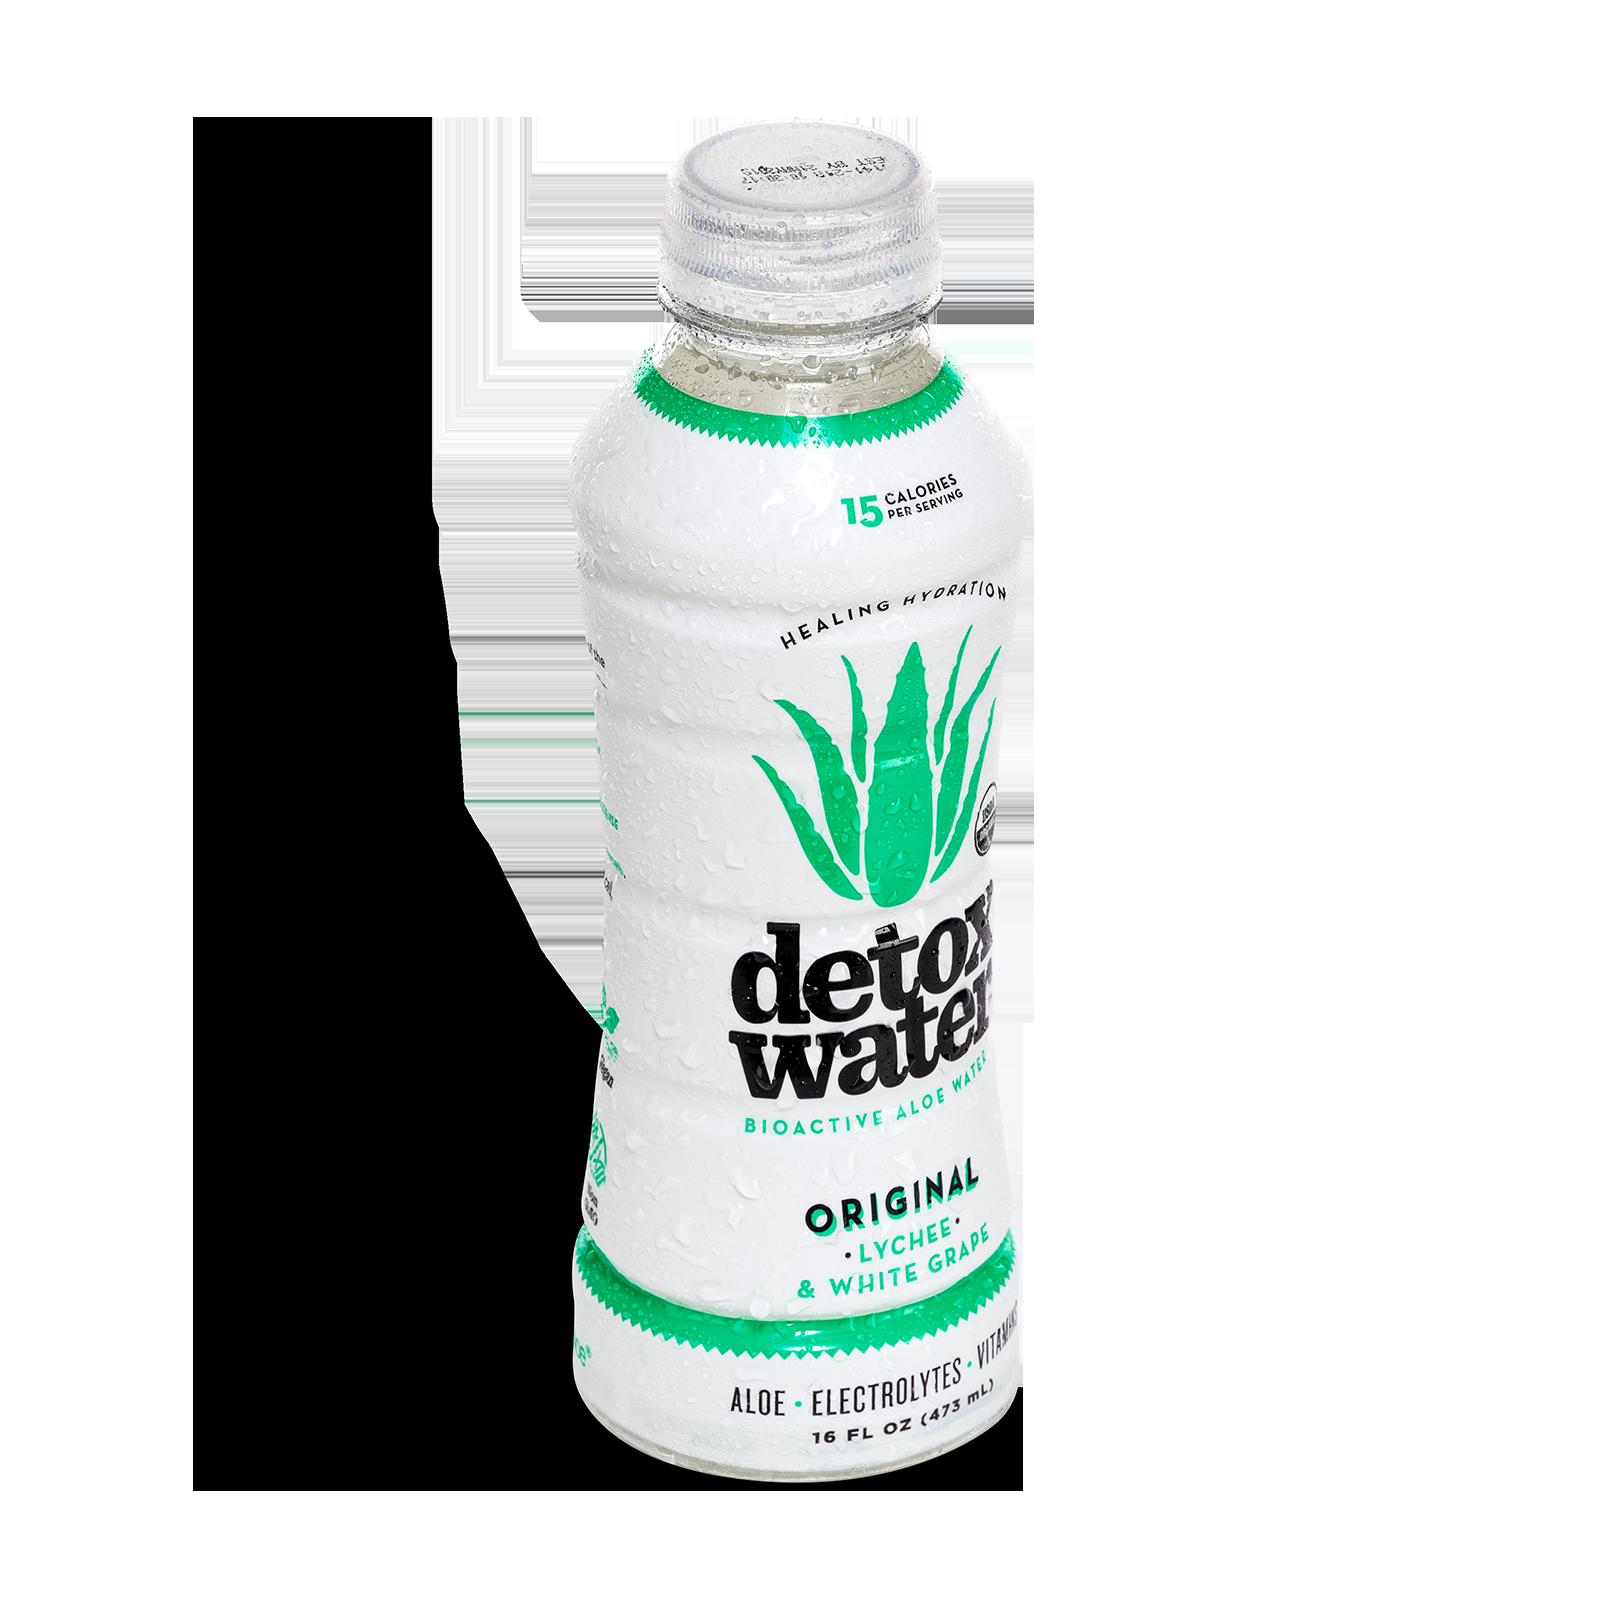 Beverage product photo